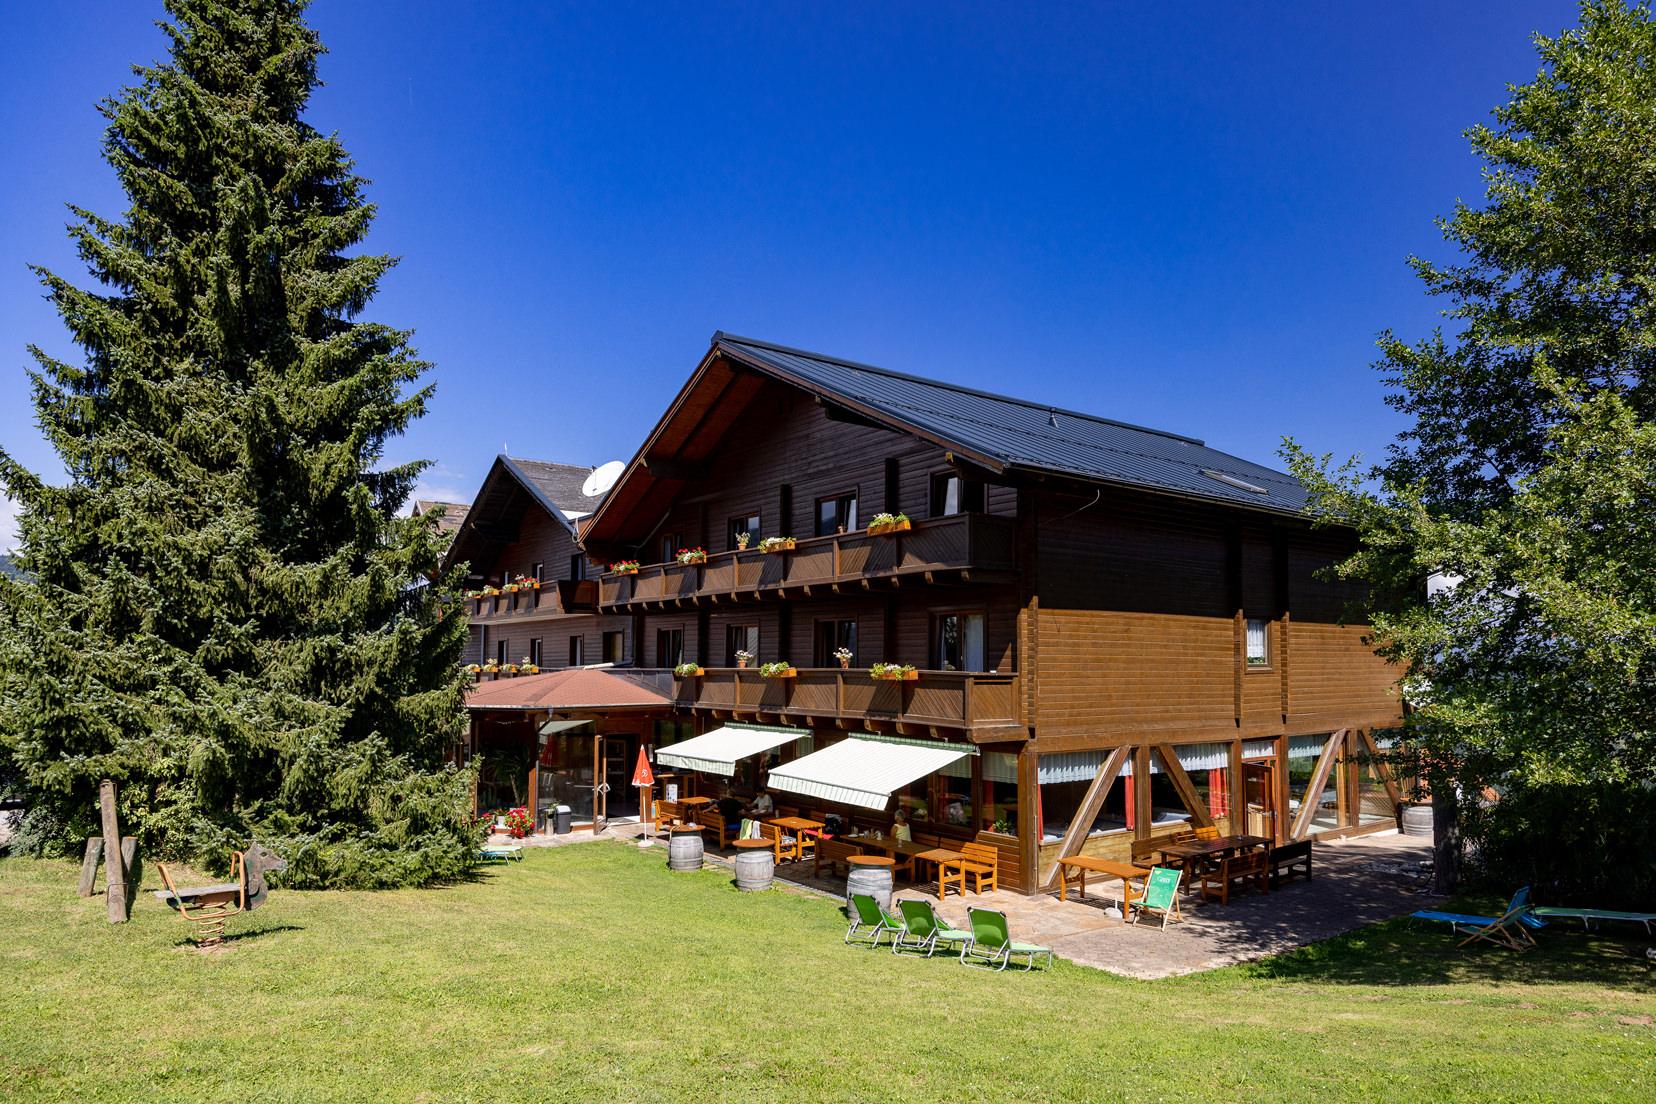 Das Naturhotel Enzianhof in Oberwald | © Naturhotel Enzianhof